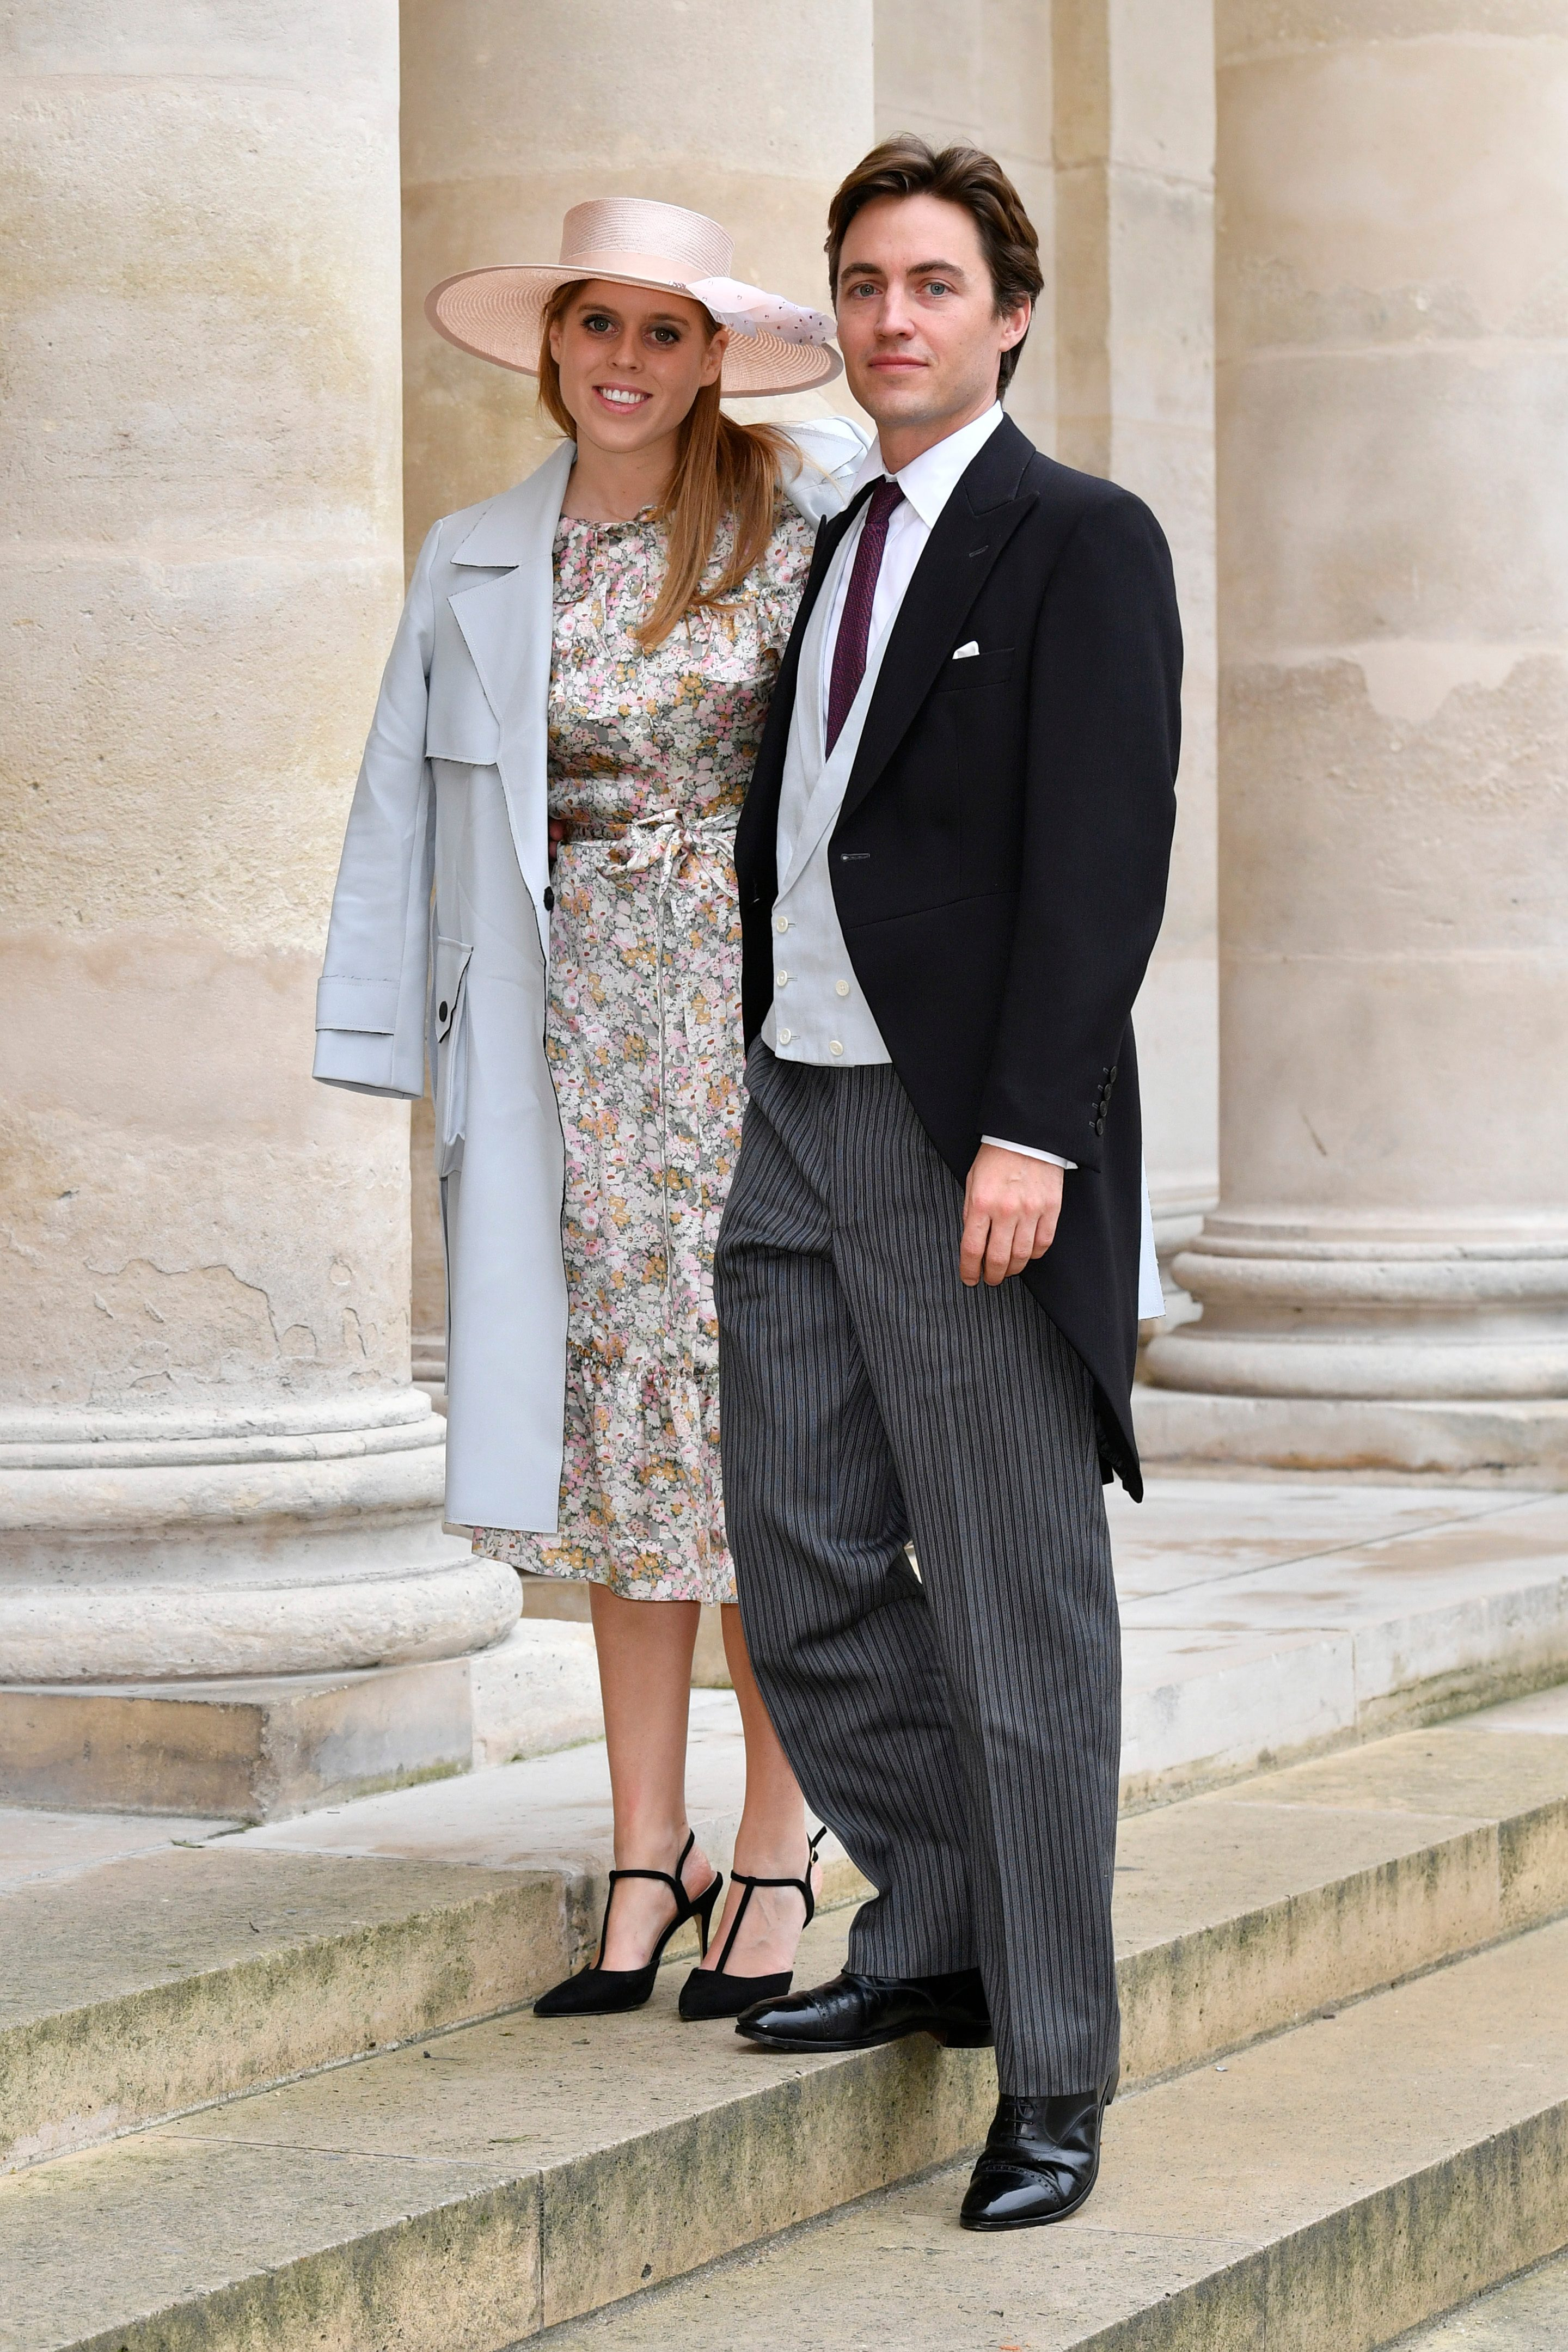 Princess Beatrice d'York and her fiance Edoardo Mapelli Mozzi wedding